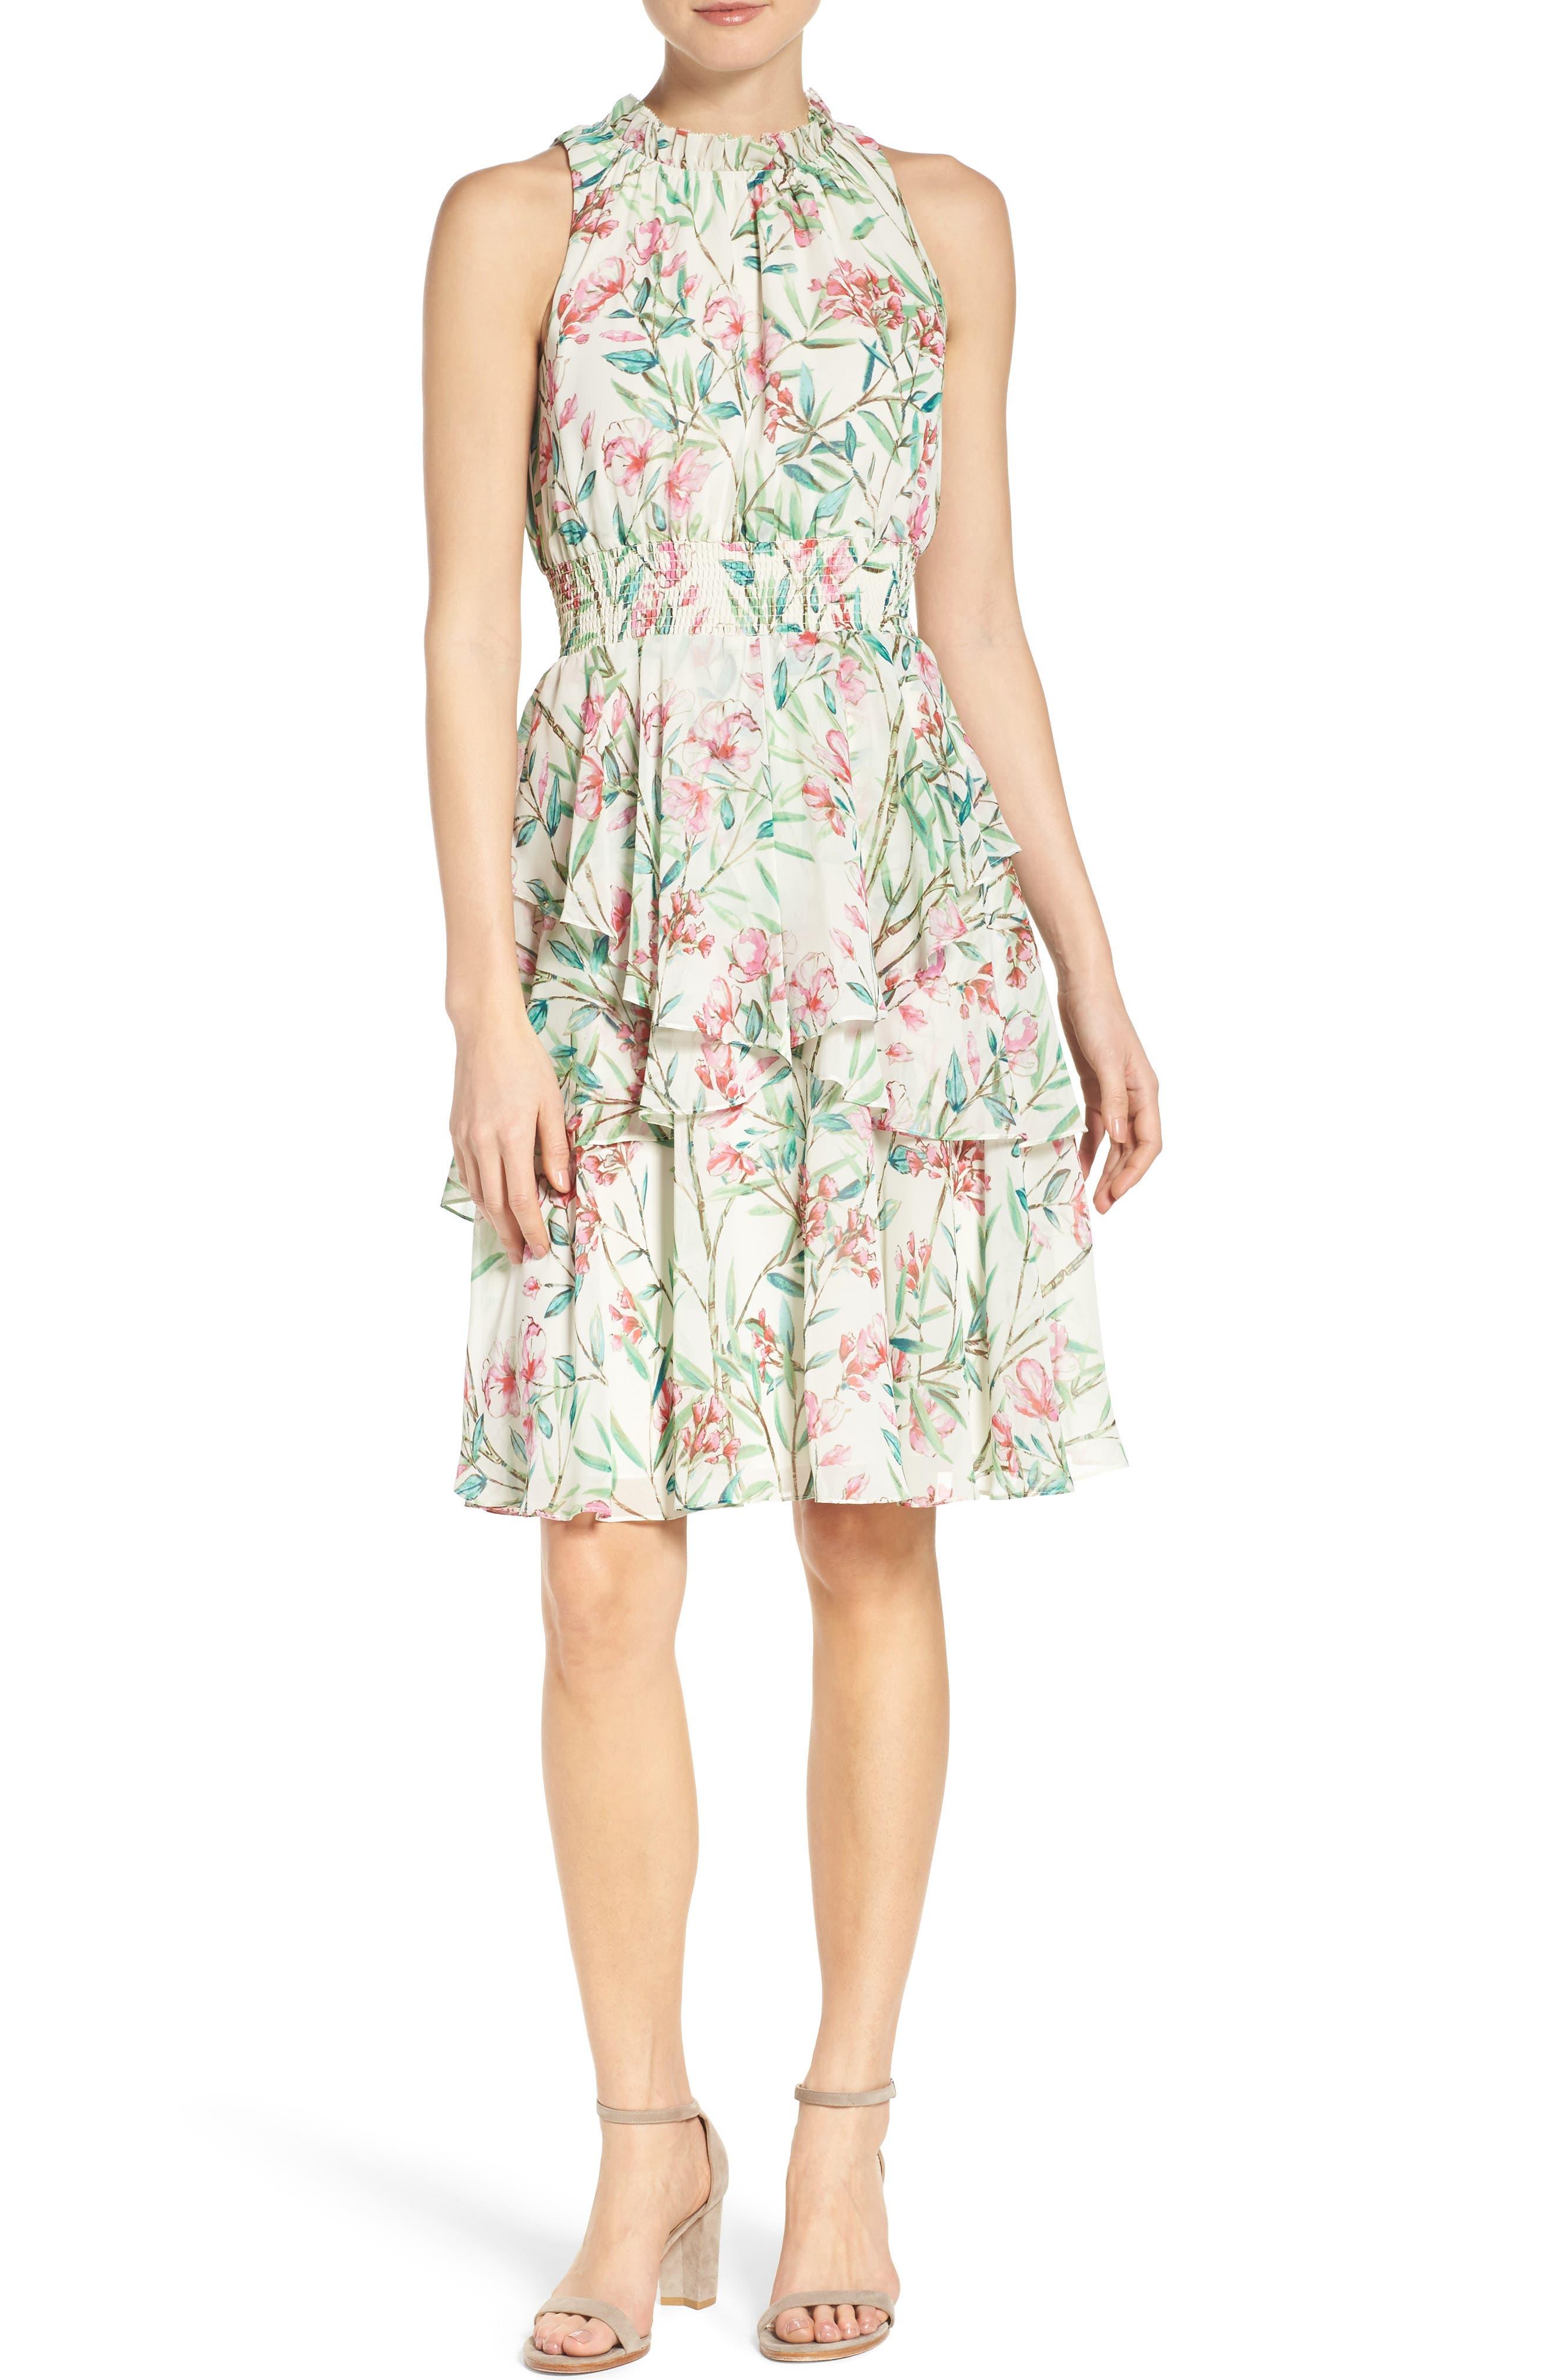 ELIZA J, Chiffon Fit & Flare Dress, Alternate thumbnail 5, color, 901